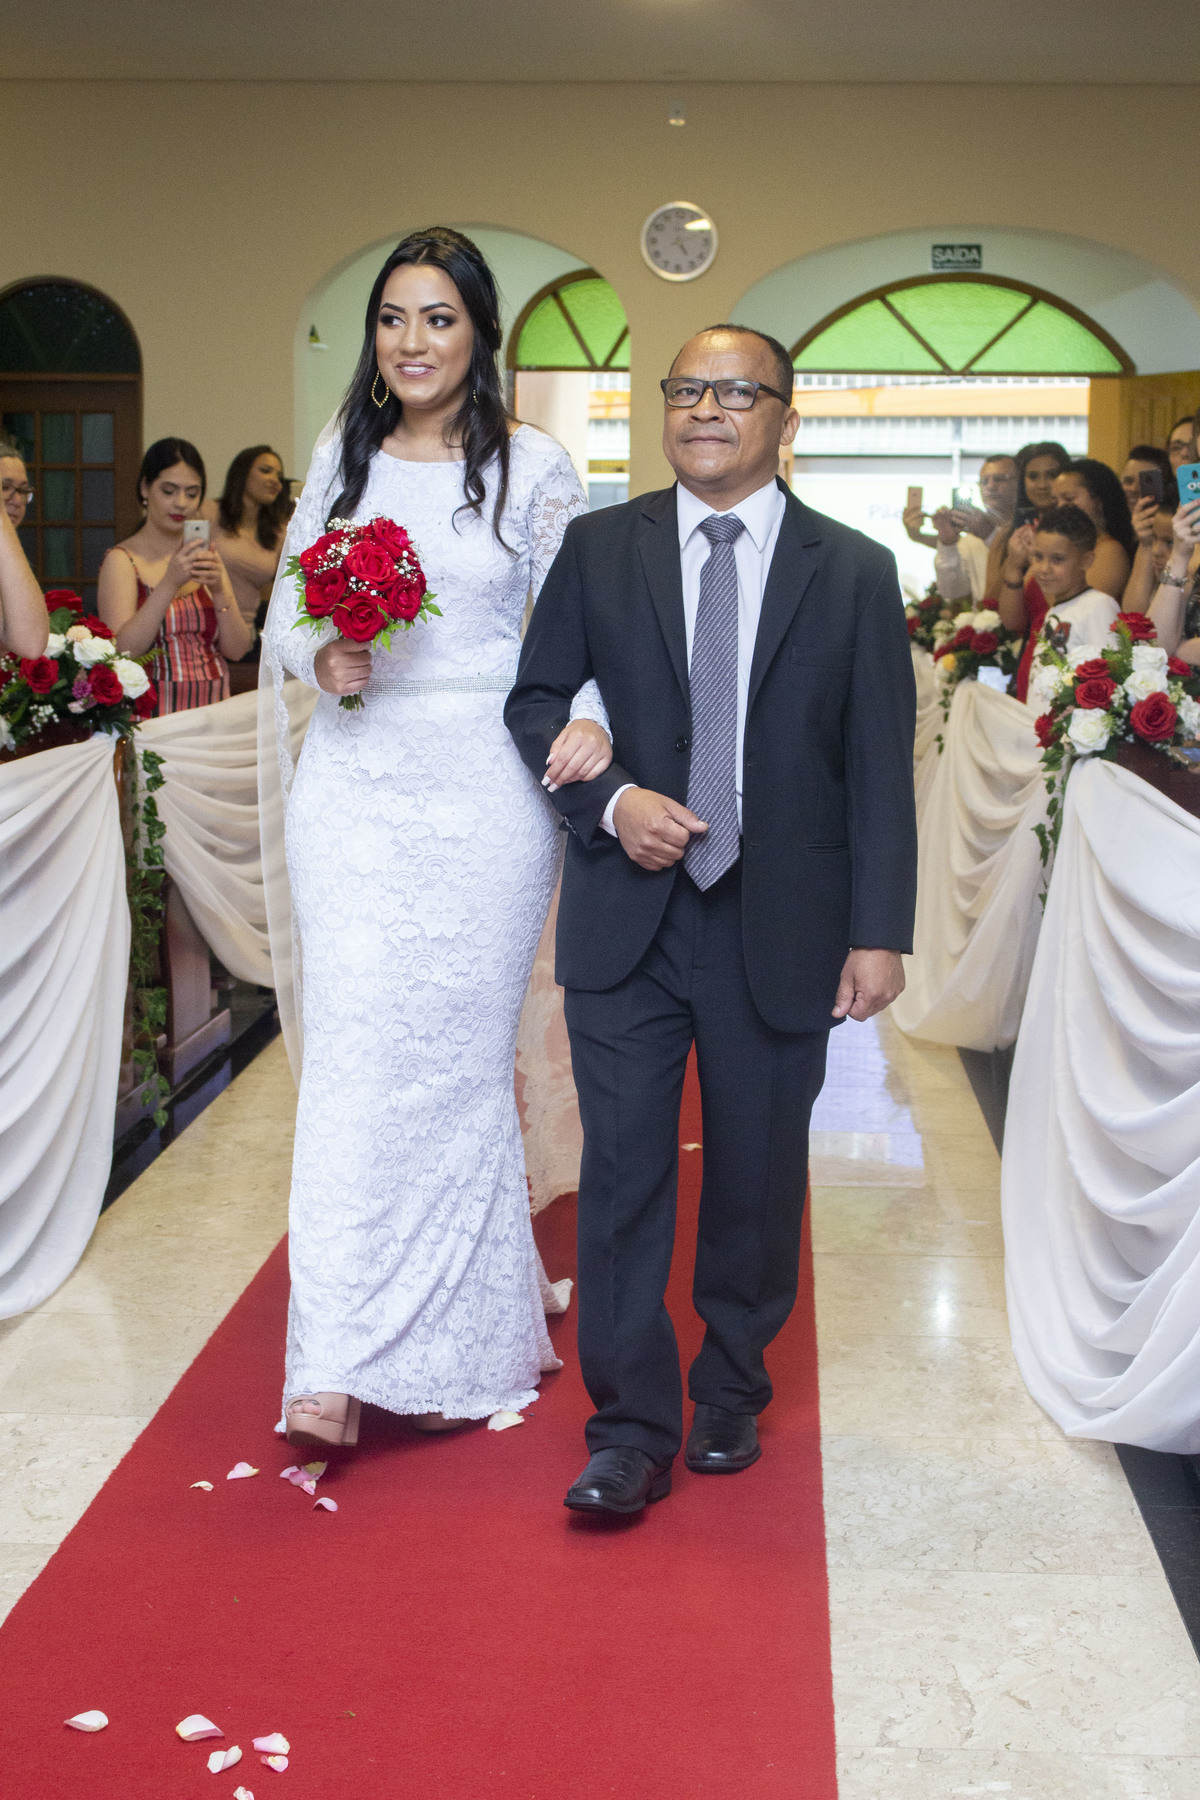 Casamento Bruno e Thalia na capela, entrada da noiva